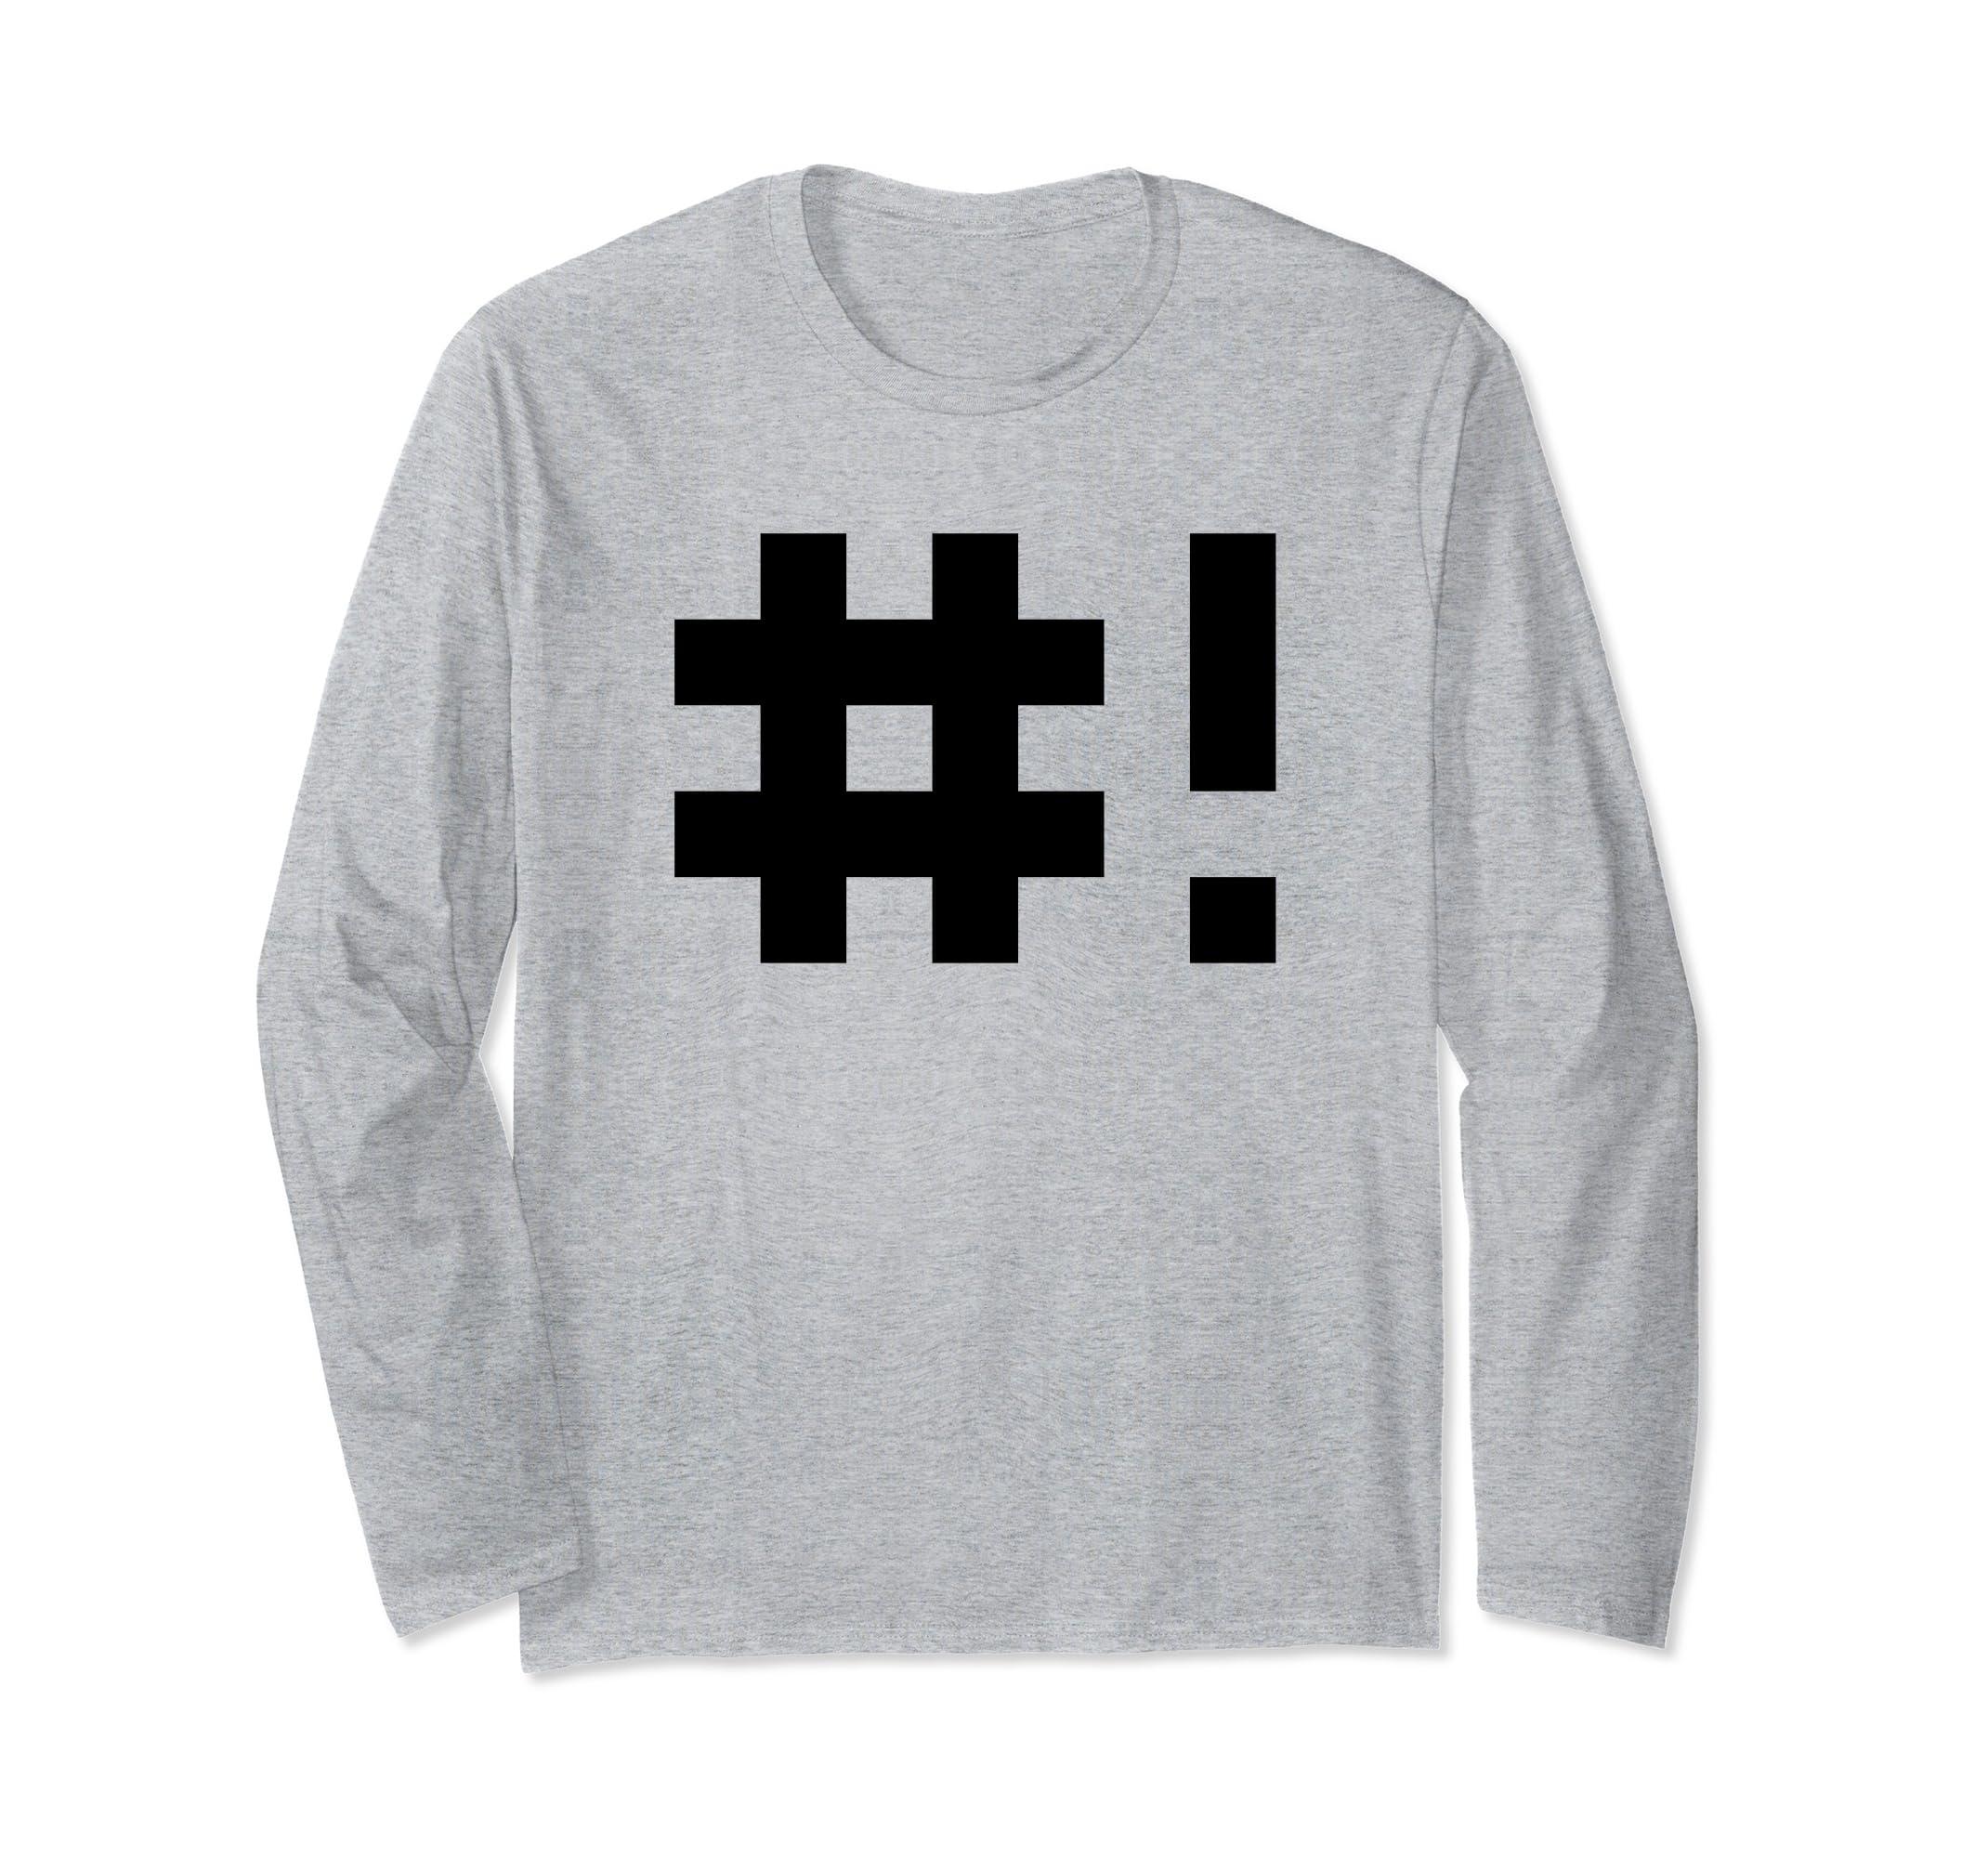 #! Hashbang Long Sleeve Shirt for Command Line Hackers-ln